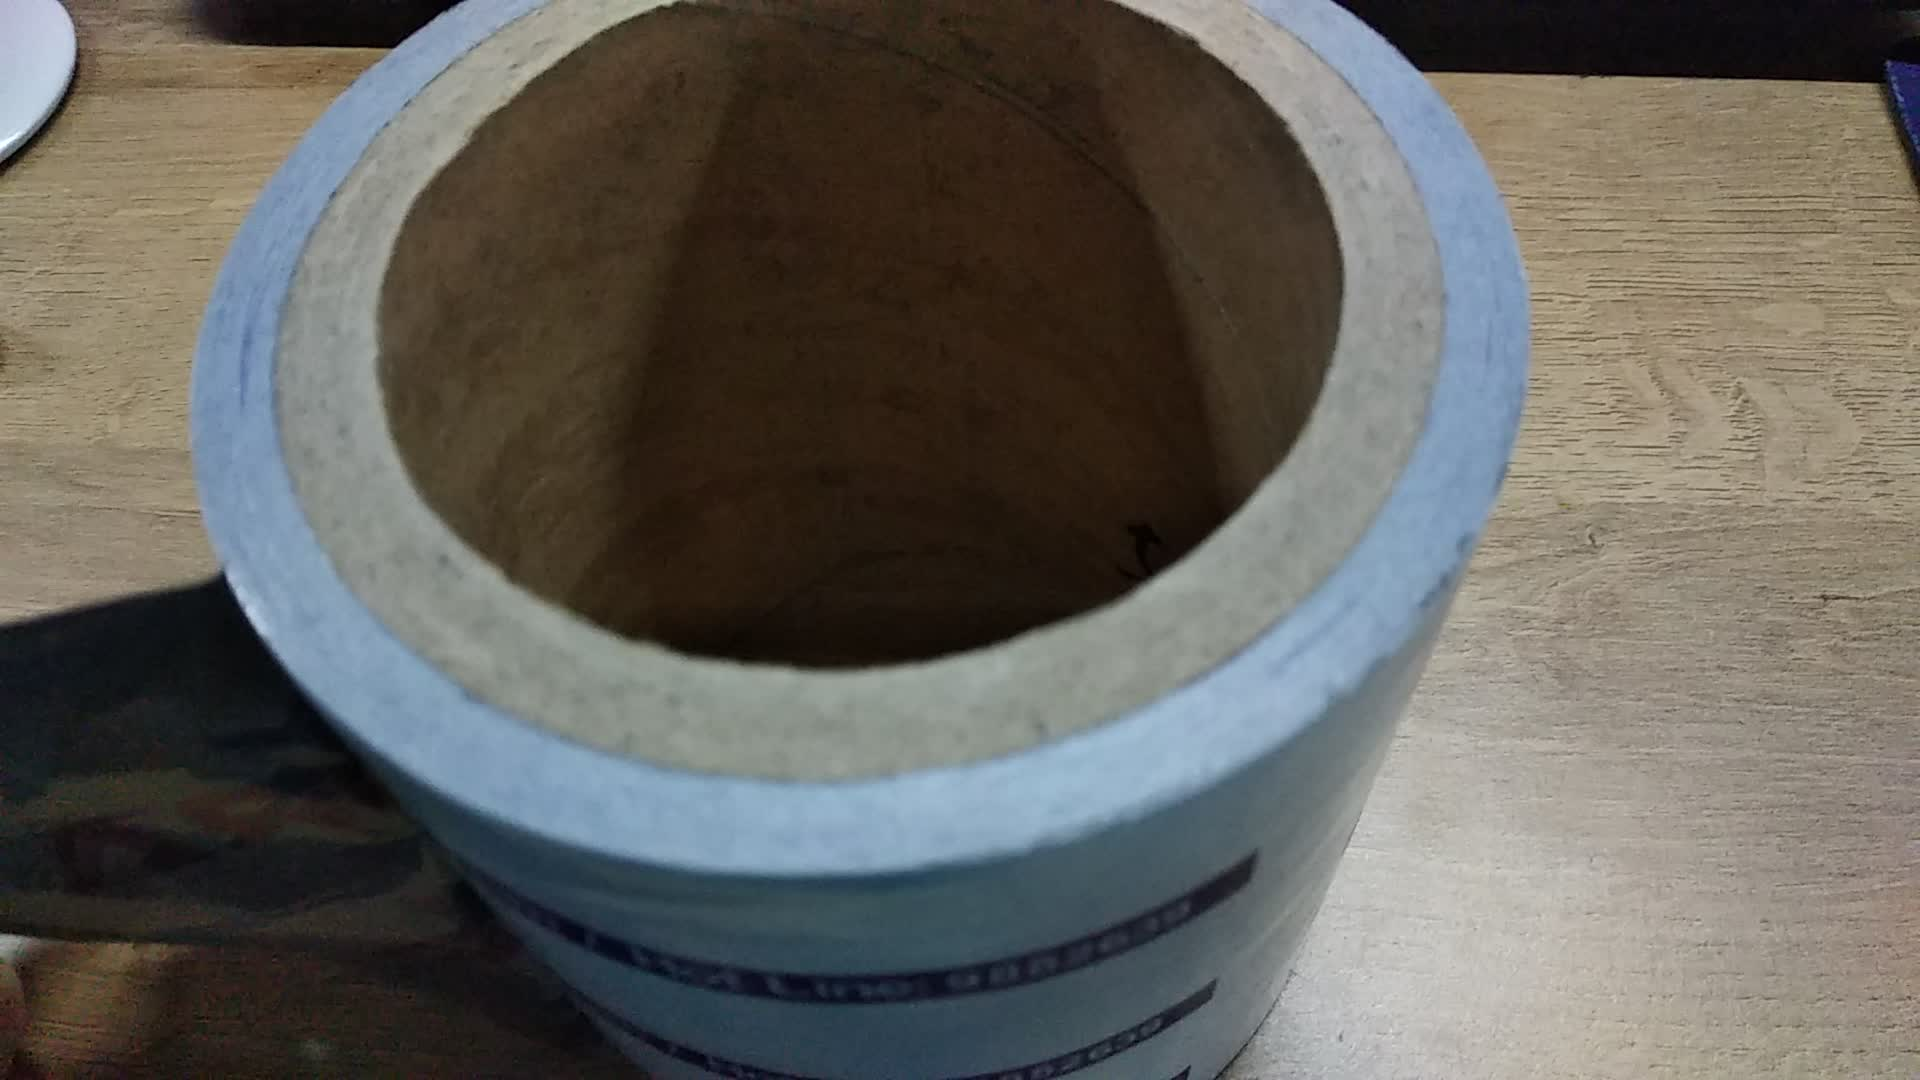 MDF เฟอร์นิเจอร์ประตูป้องกันฟิล์มสำหรับไม้/Self Adhesive ตกแต่งพลาสติกโปร่งใสป้องกันฟิล์ม